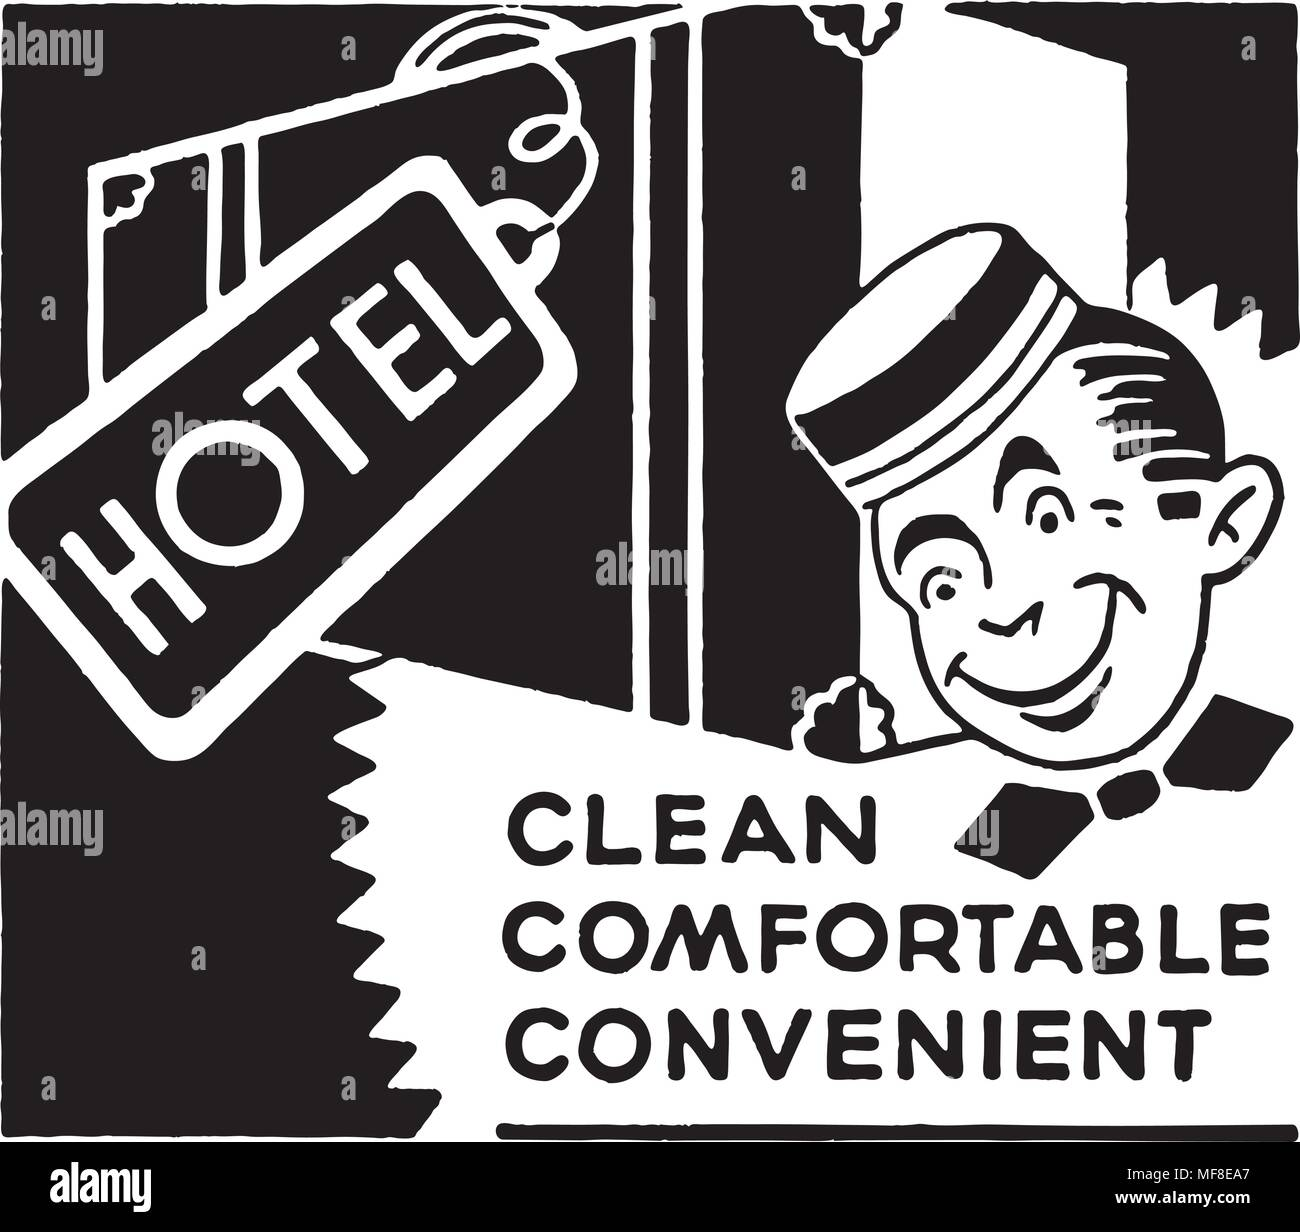 Hotel Clean Comfortable - Retro Ad Art Banner - Stock Image